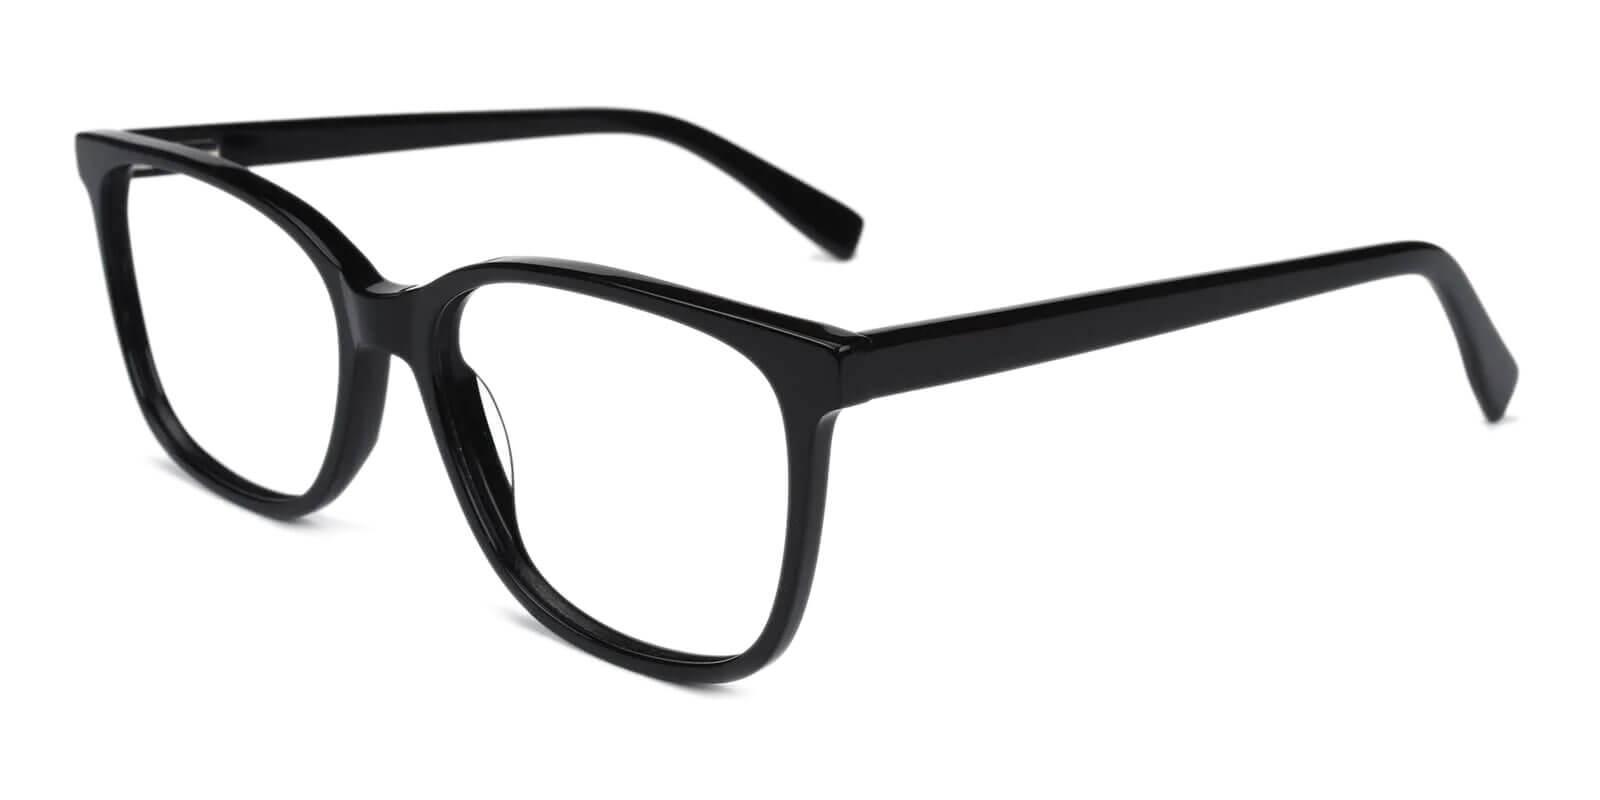 Groove Black Acetate Eyeglasses , SpringHinges , UniversalBridgeFit Frames from ABBE Glasses